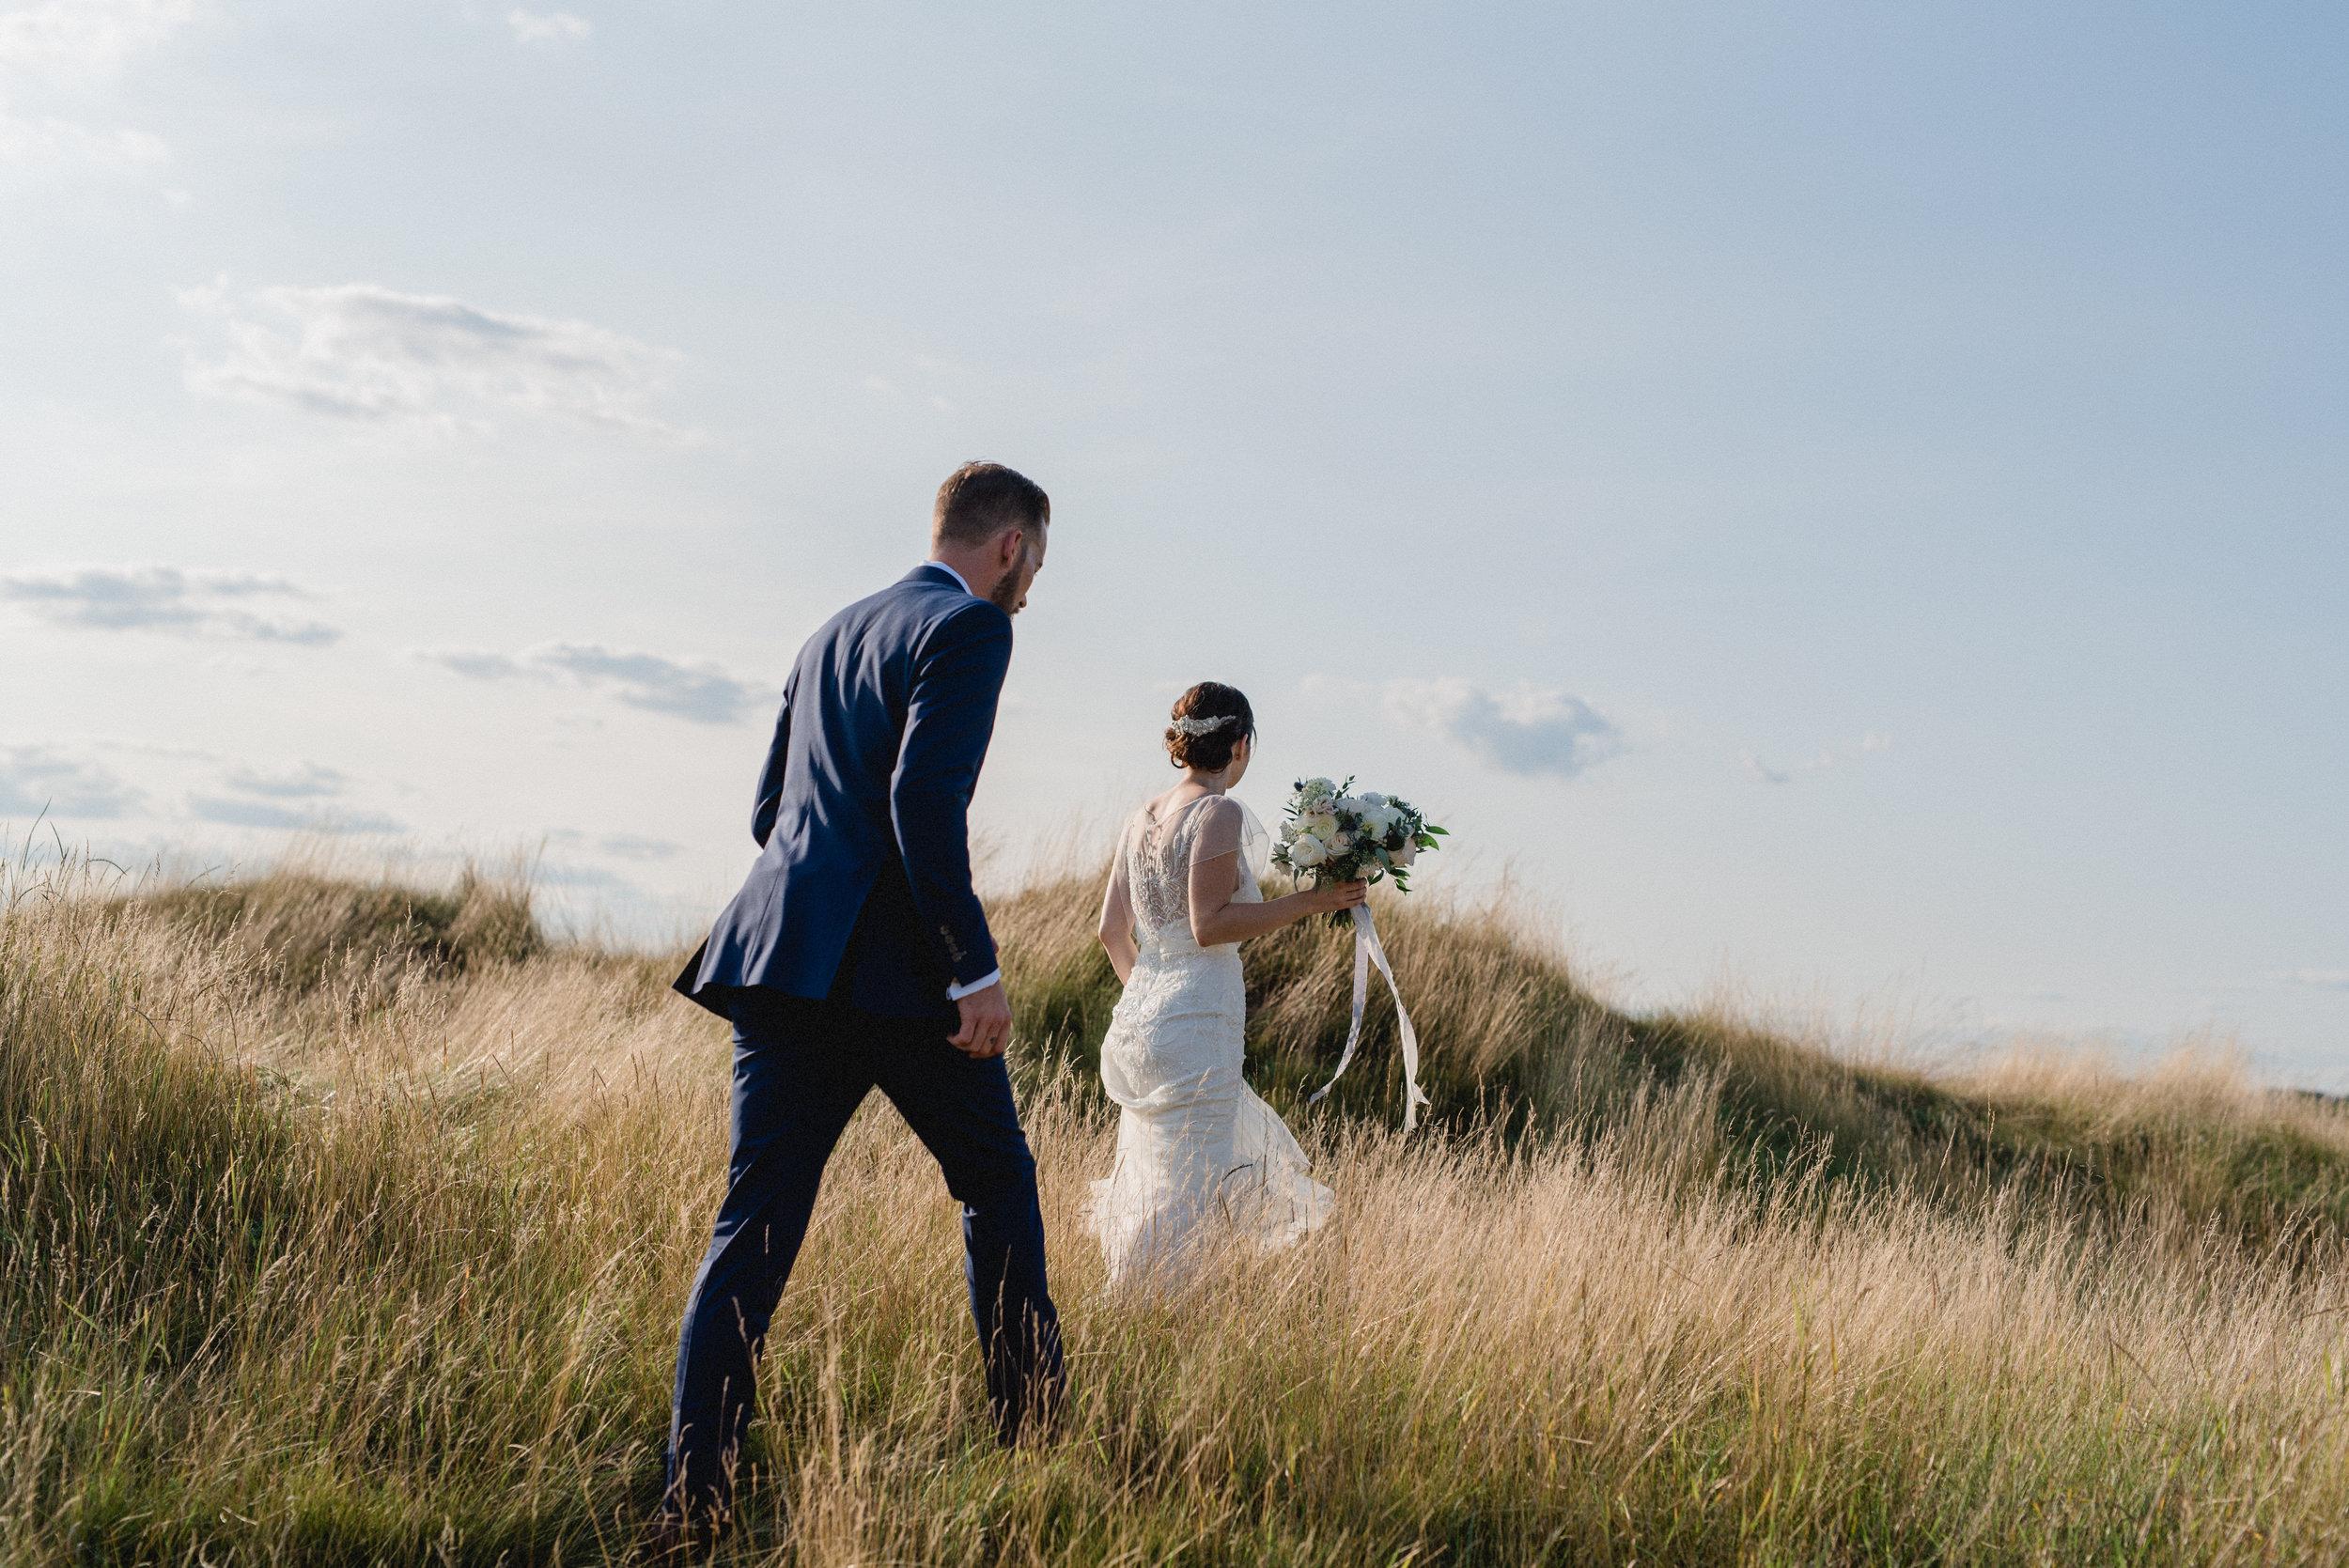 Pipers-Heath-Milton-Wedding-74.jpg